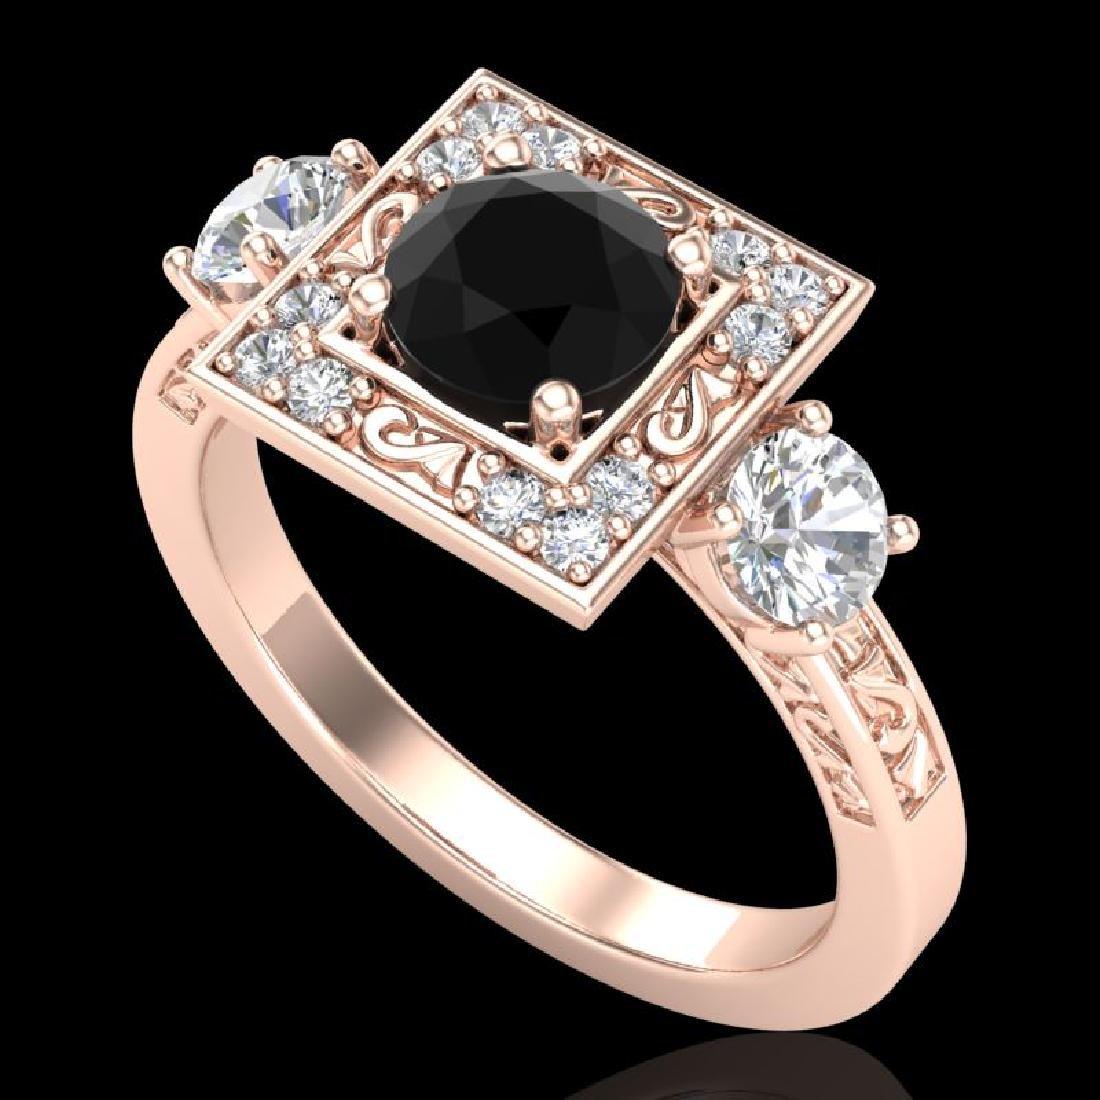 1.55 CTW Fancy Black Diamond Solitaire Art Deco 3 Stone